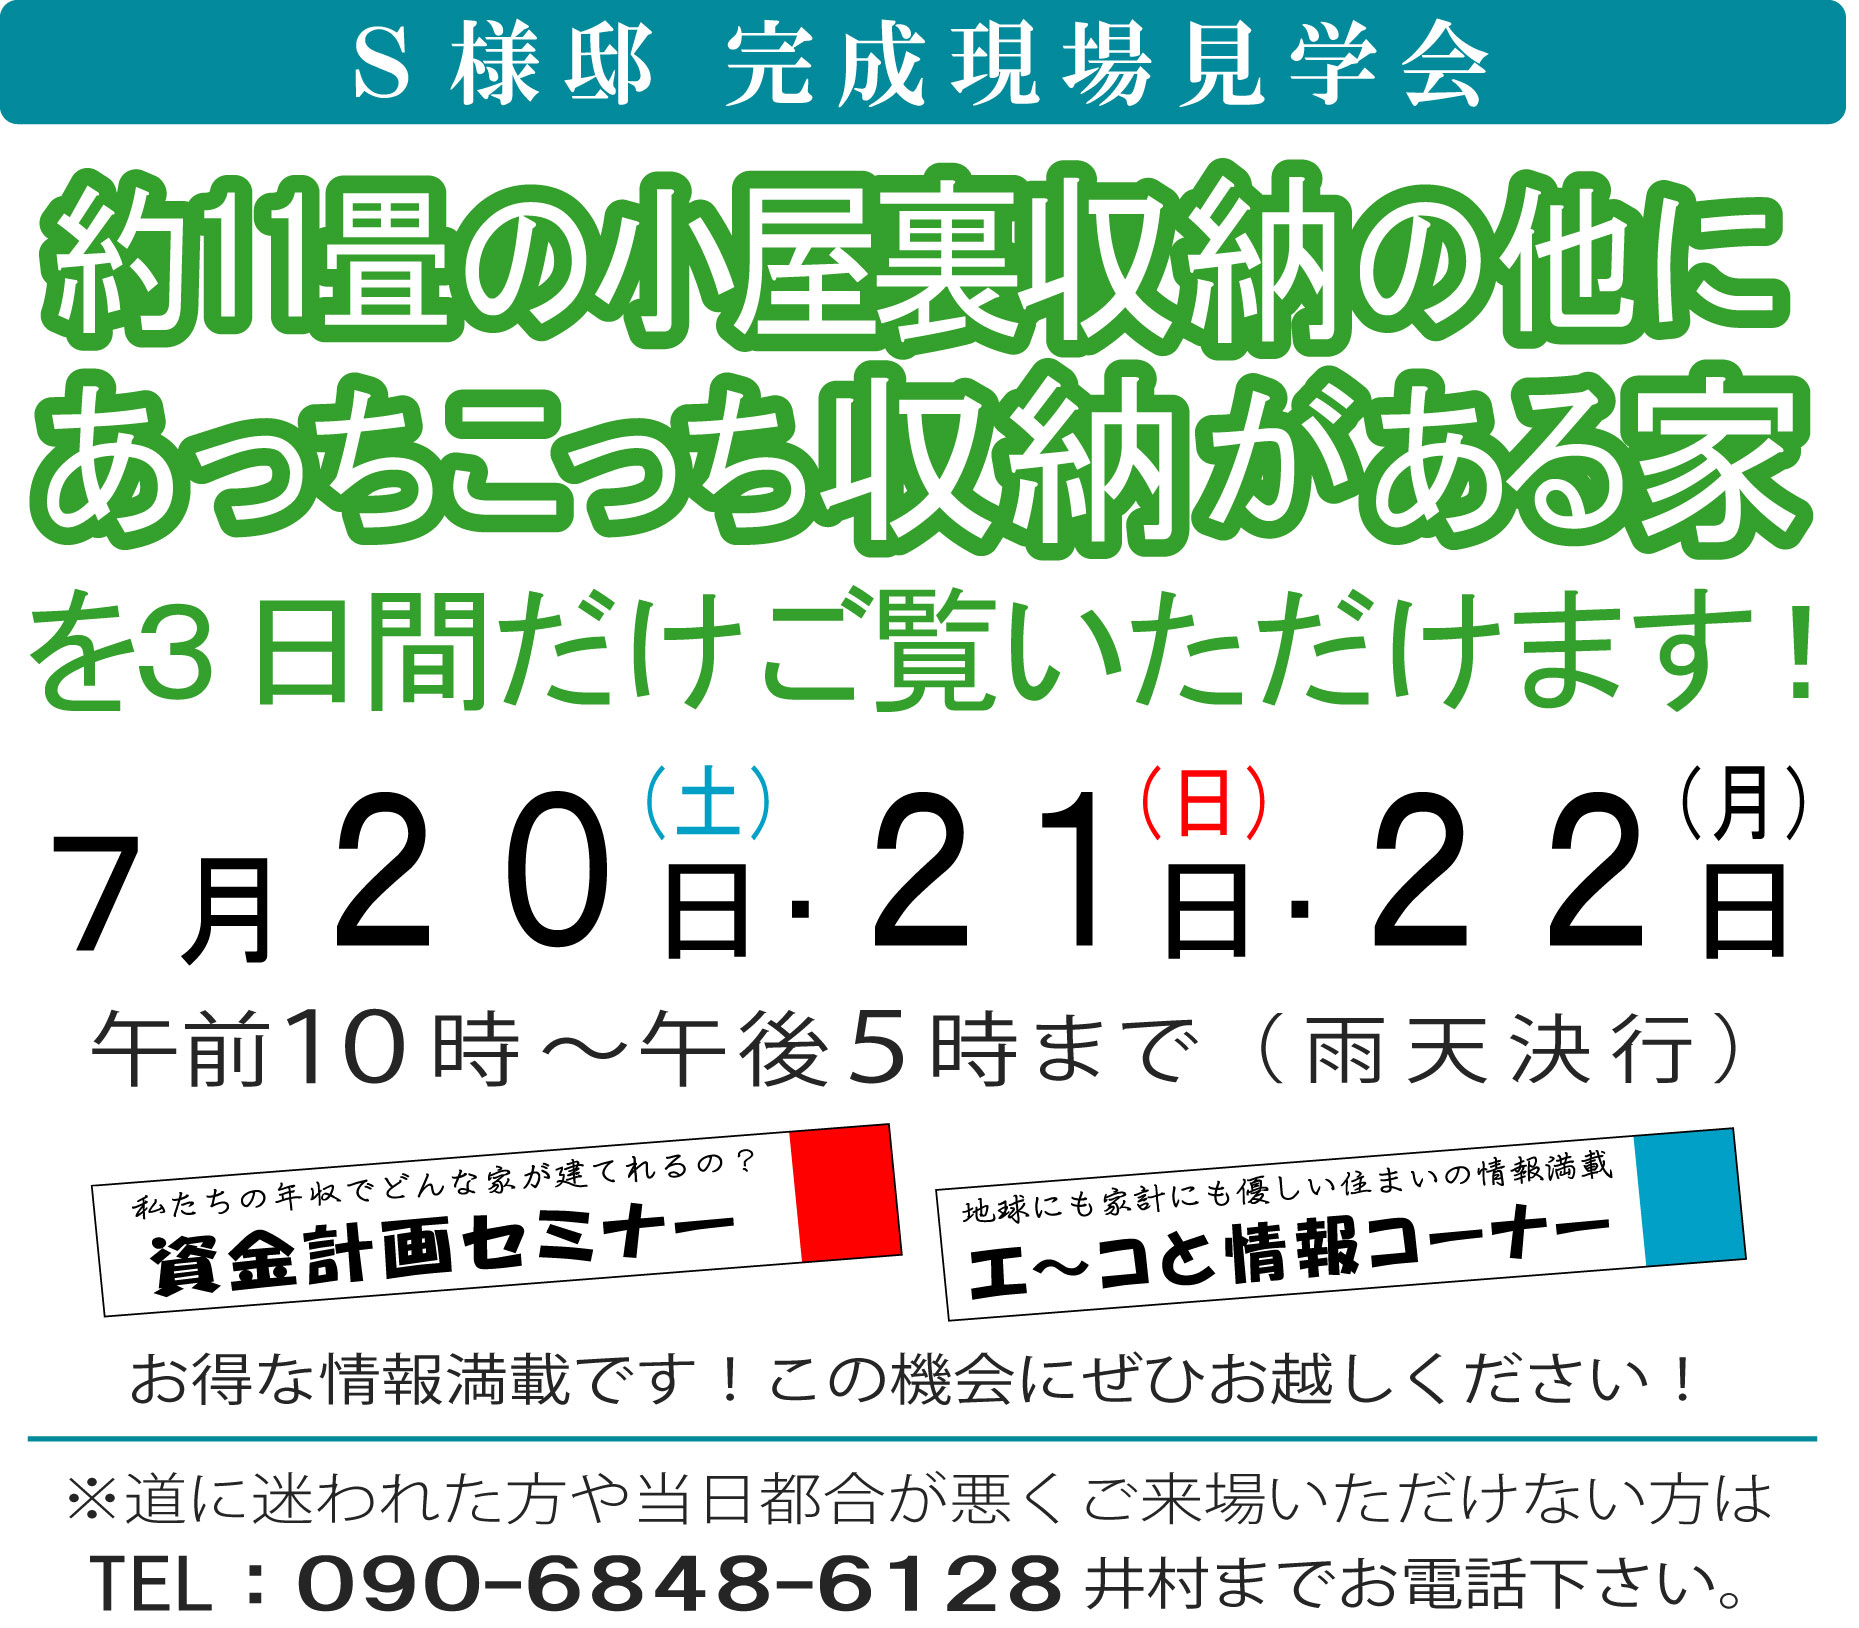 KuraSi-natu-sin73-04.jpg